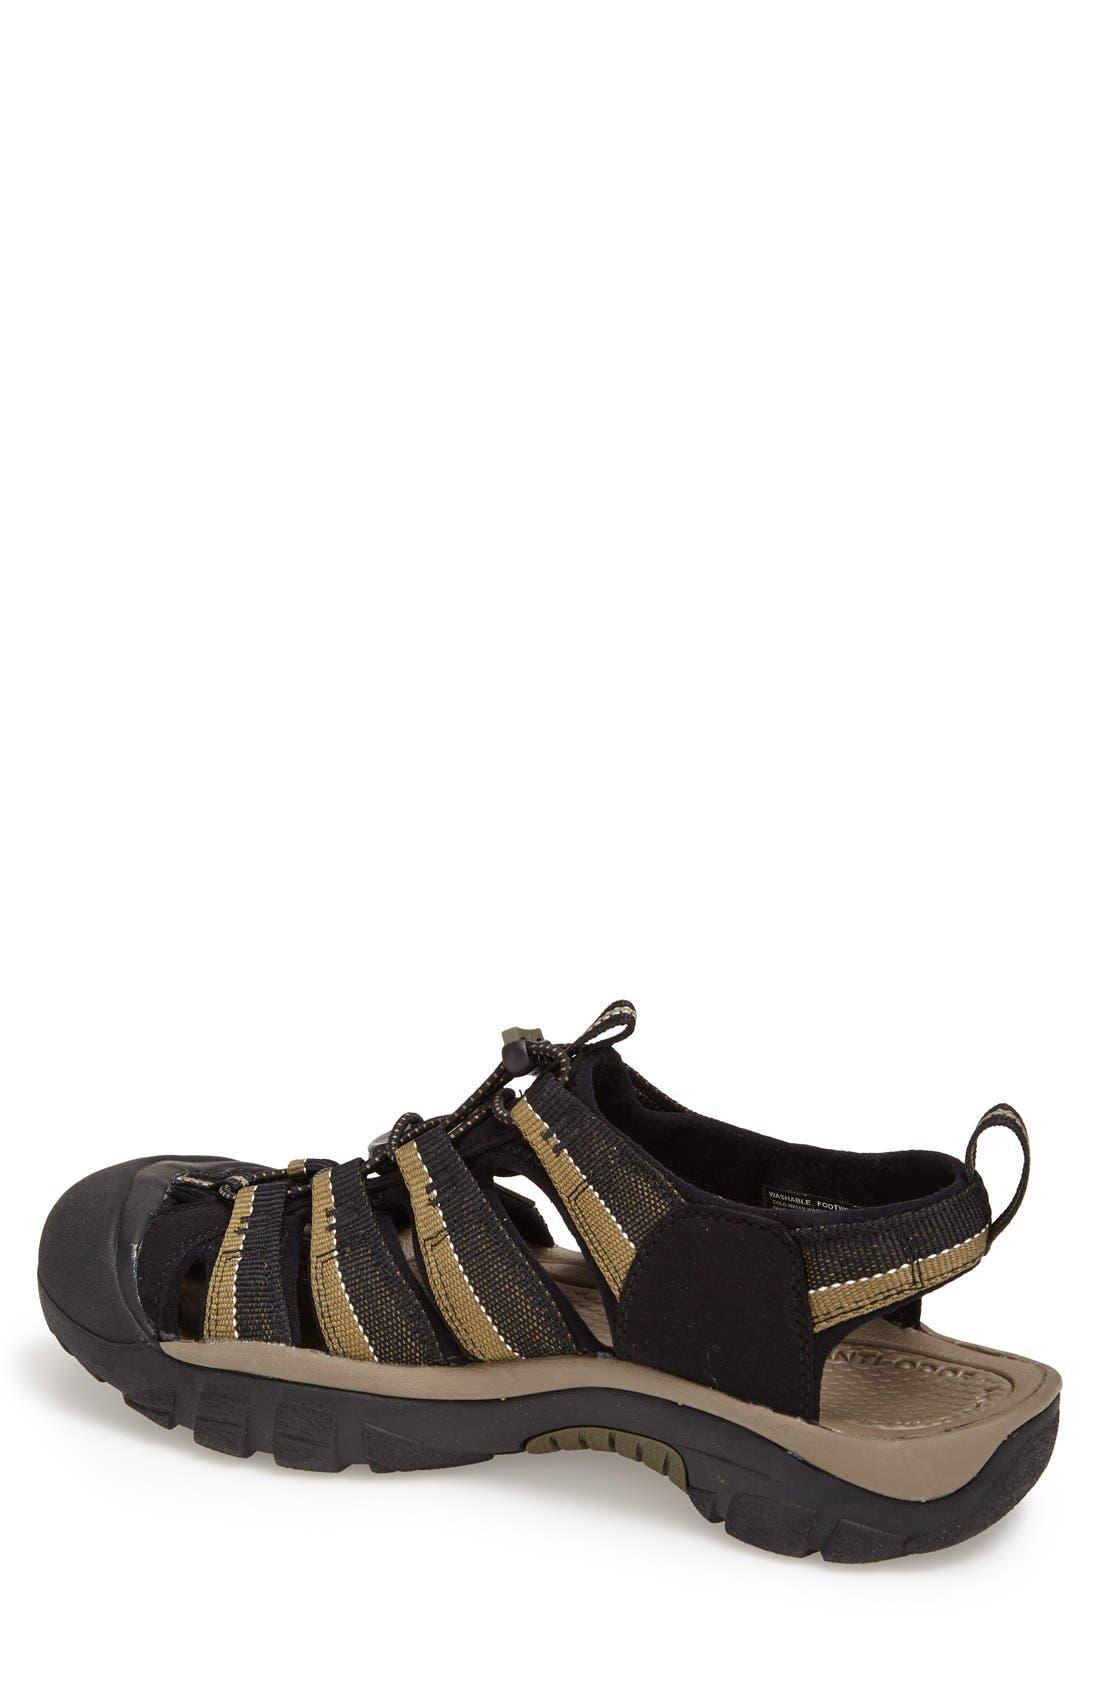 'Newport H2' Sandal,                             Alternate thumbnail 4, color,                             BLACK/ STONE GREY